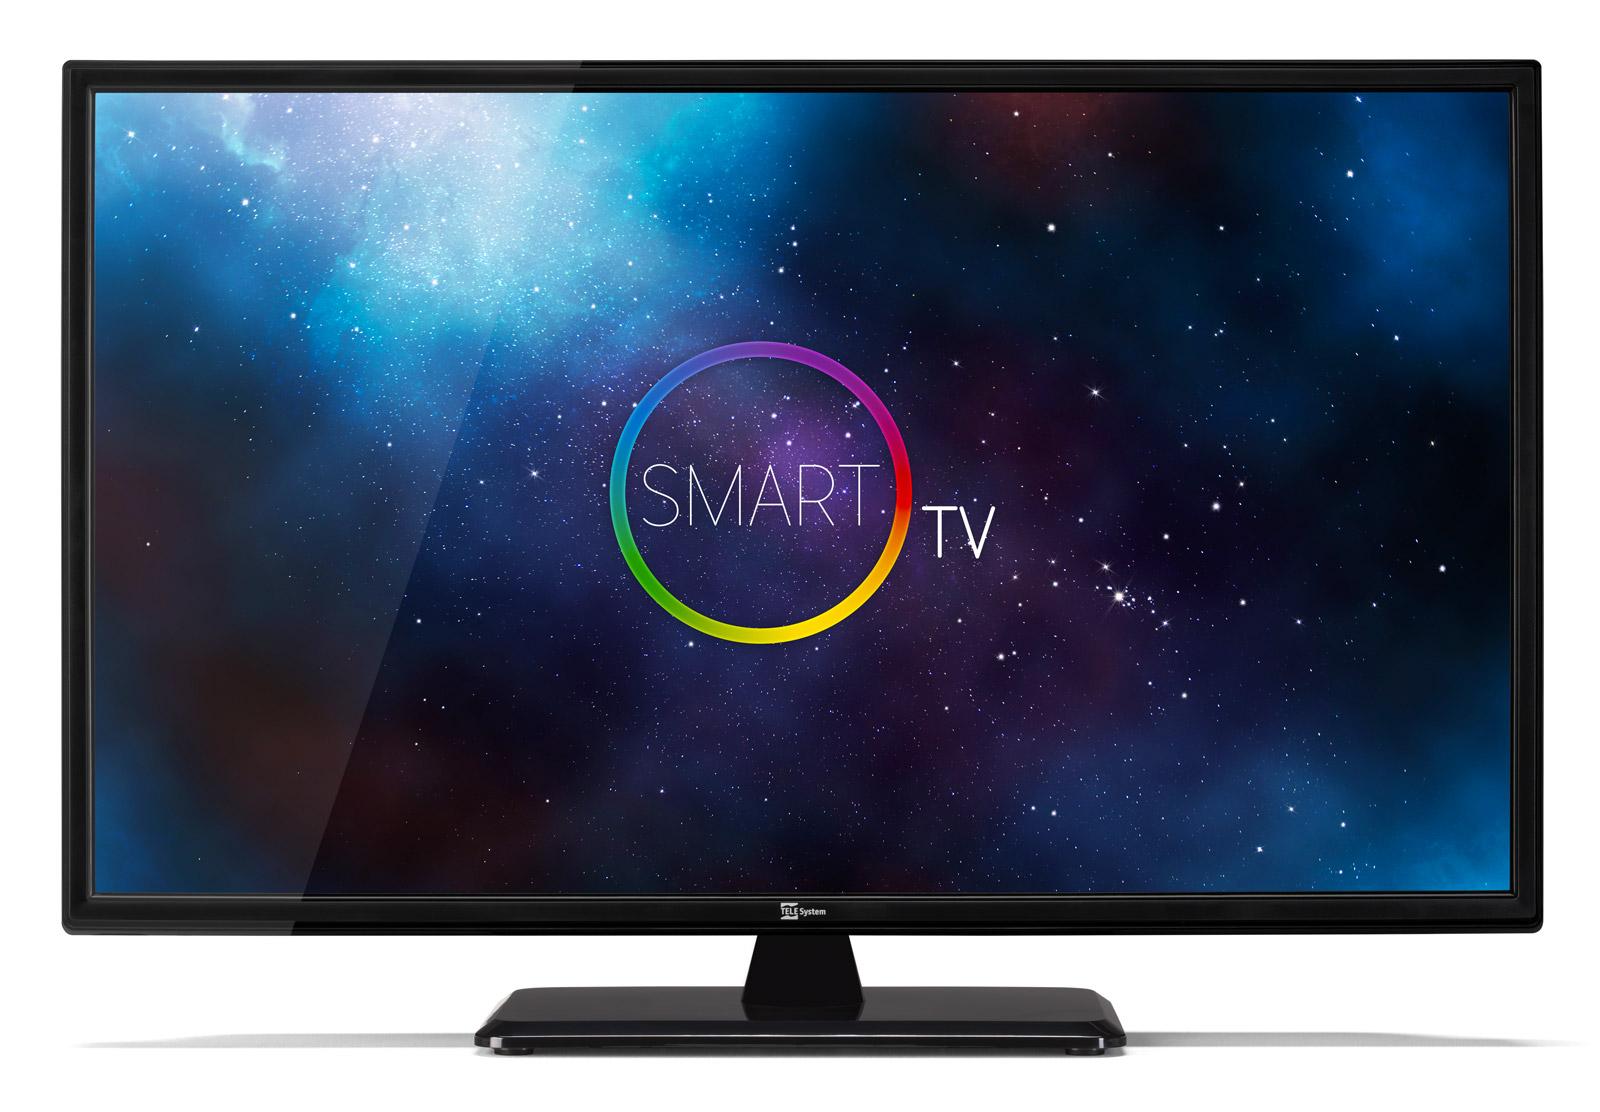 tv 4k 32 pollici smart tv con wifi  Smart TV 32 pollici - SMART32 LED08 DVB-T2/S2 HEVC